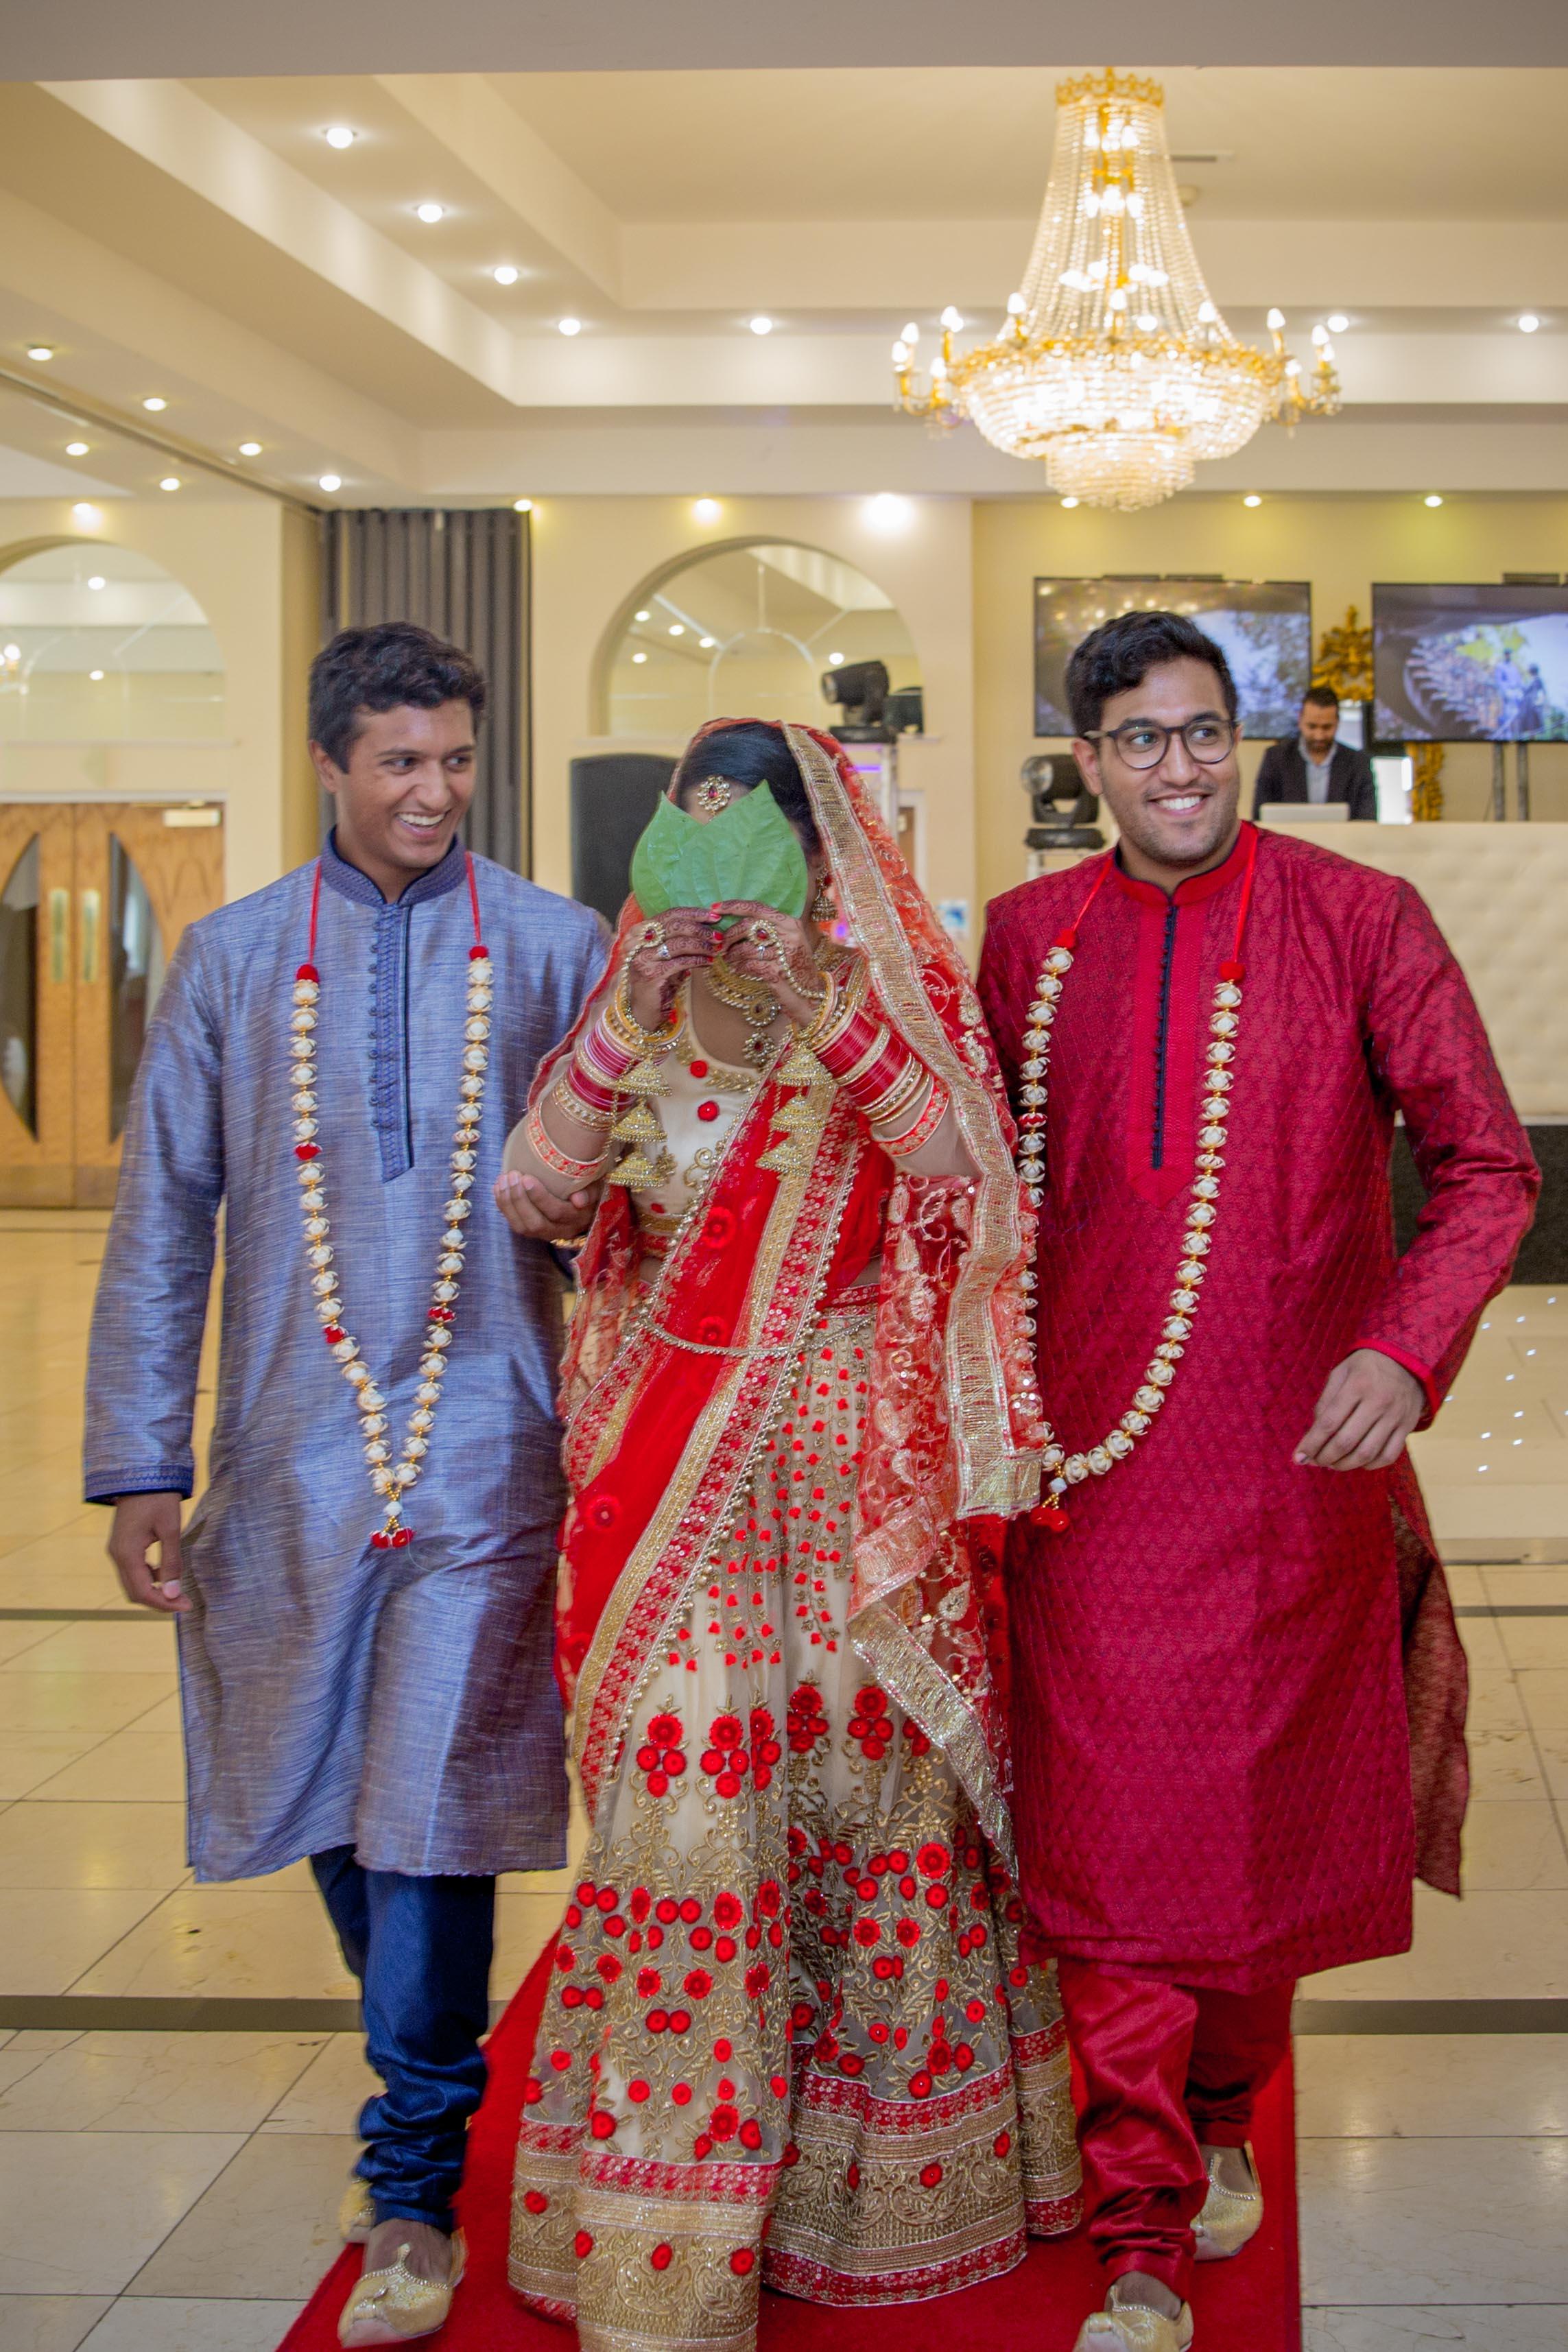 ramada-park-hall-hotel-birmingham-wolverhampton-hindu-wedding-asian-wedding-photography-natalia-smith-photography-20.jpg